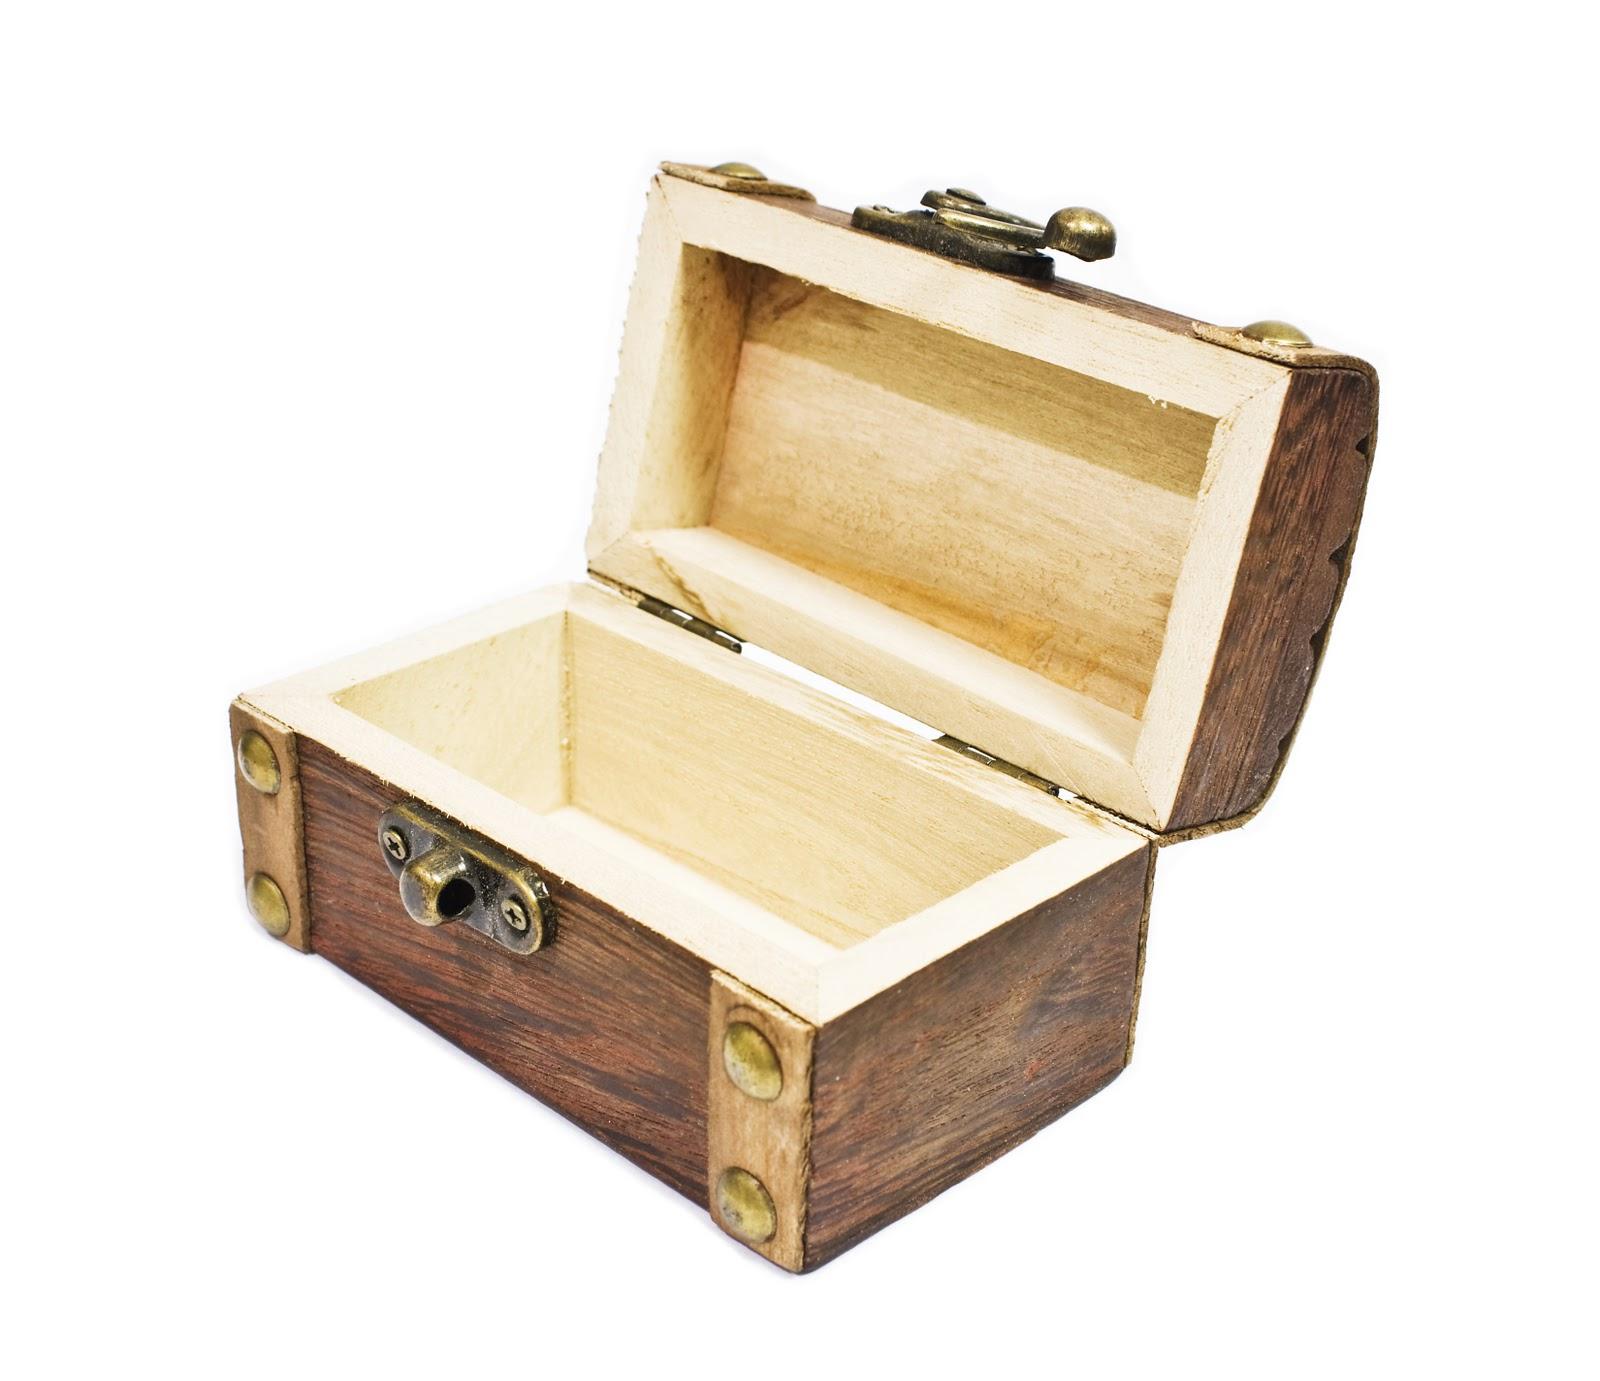 24 l ger i bibelen skattekiste for Easy things to make with wood to sell